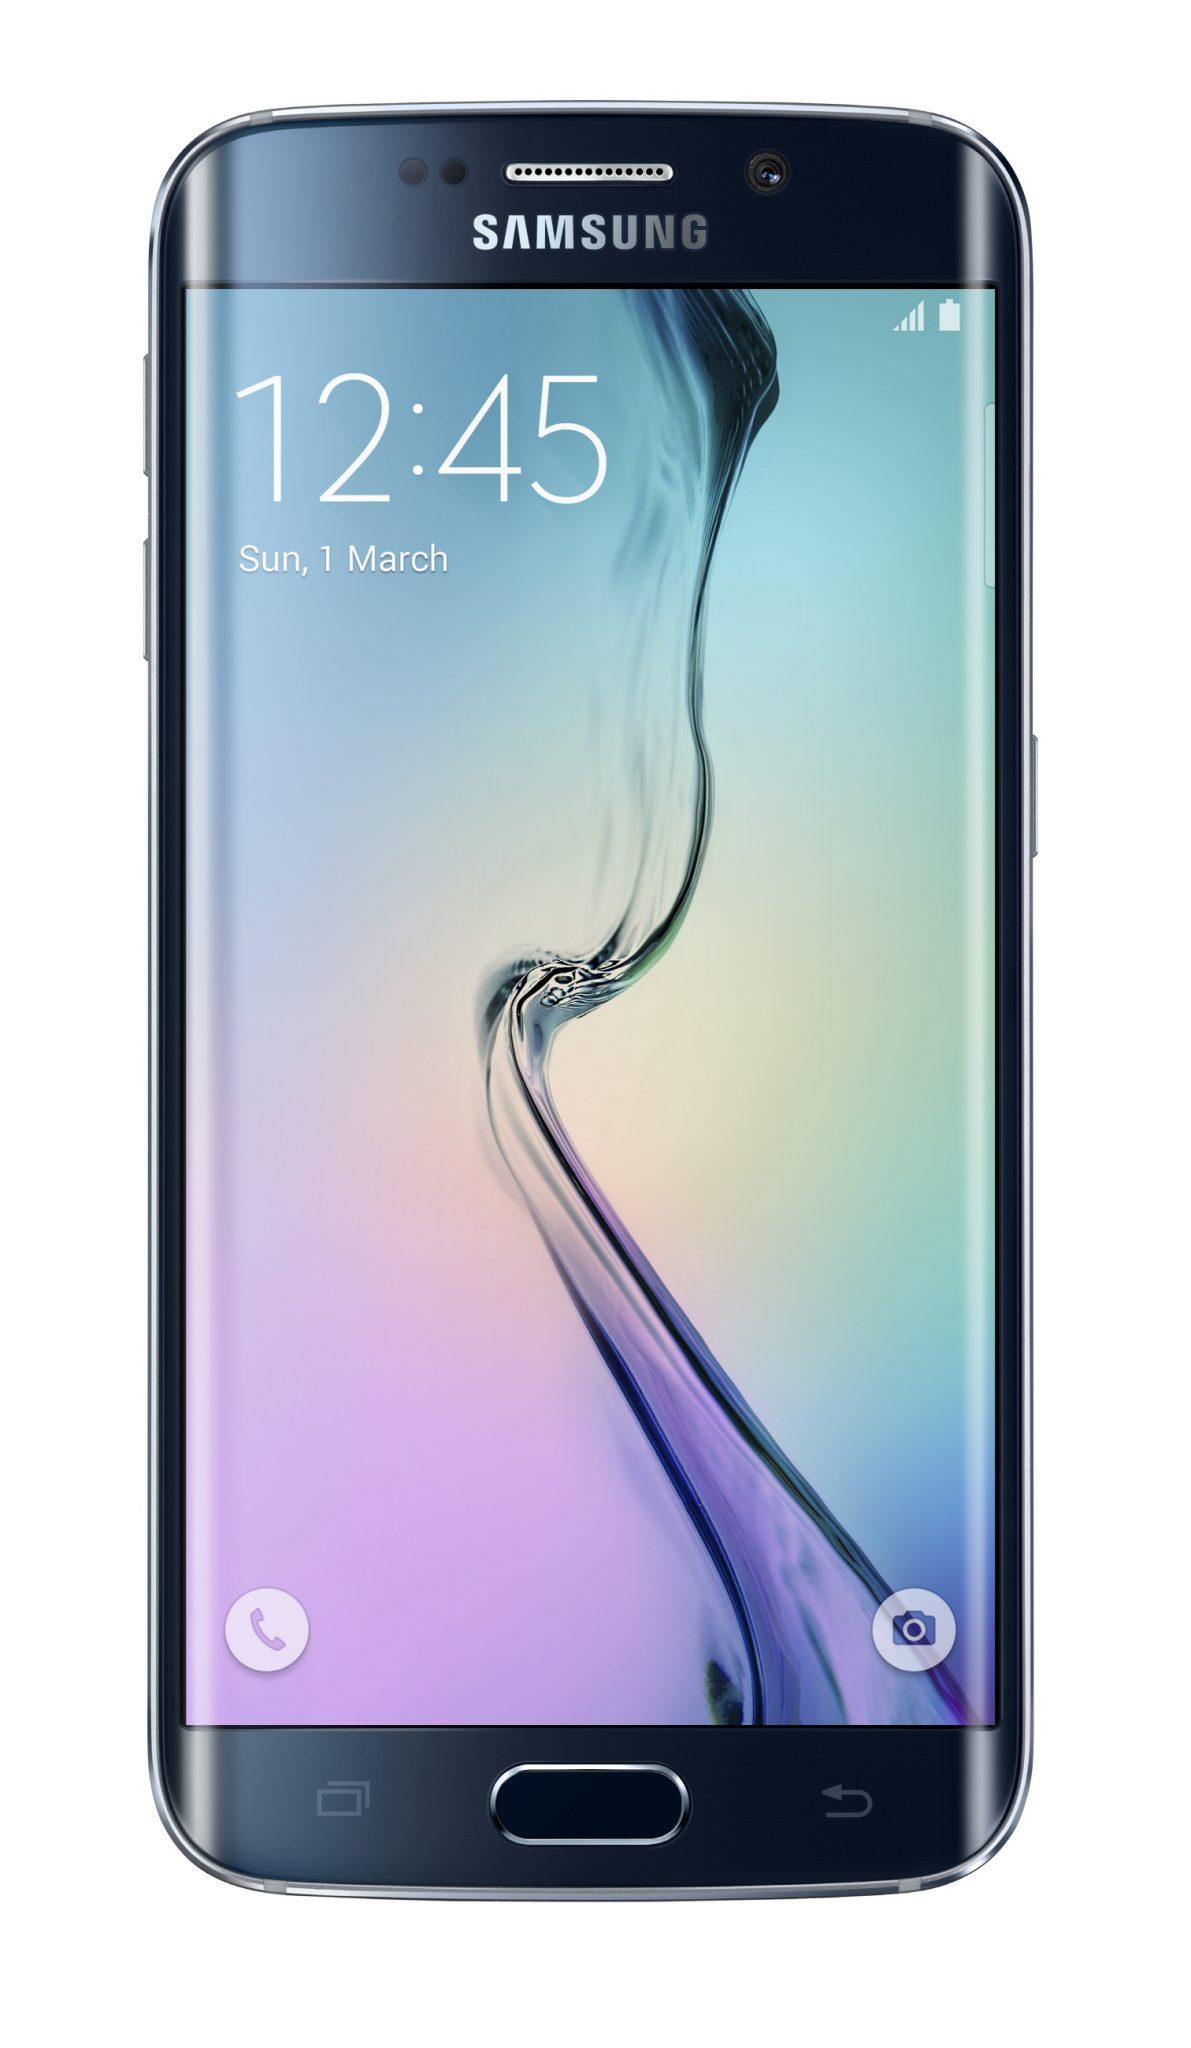 Samsung Galaxy S6 Edge - Samsung presenta Galaxy S6 e Galaxy S6 edge